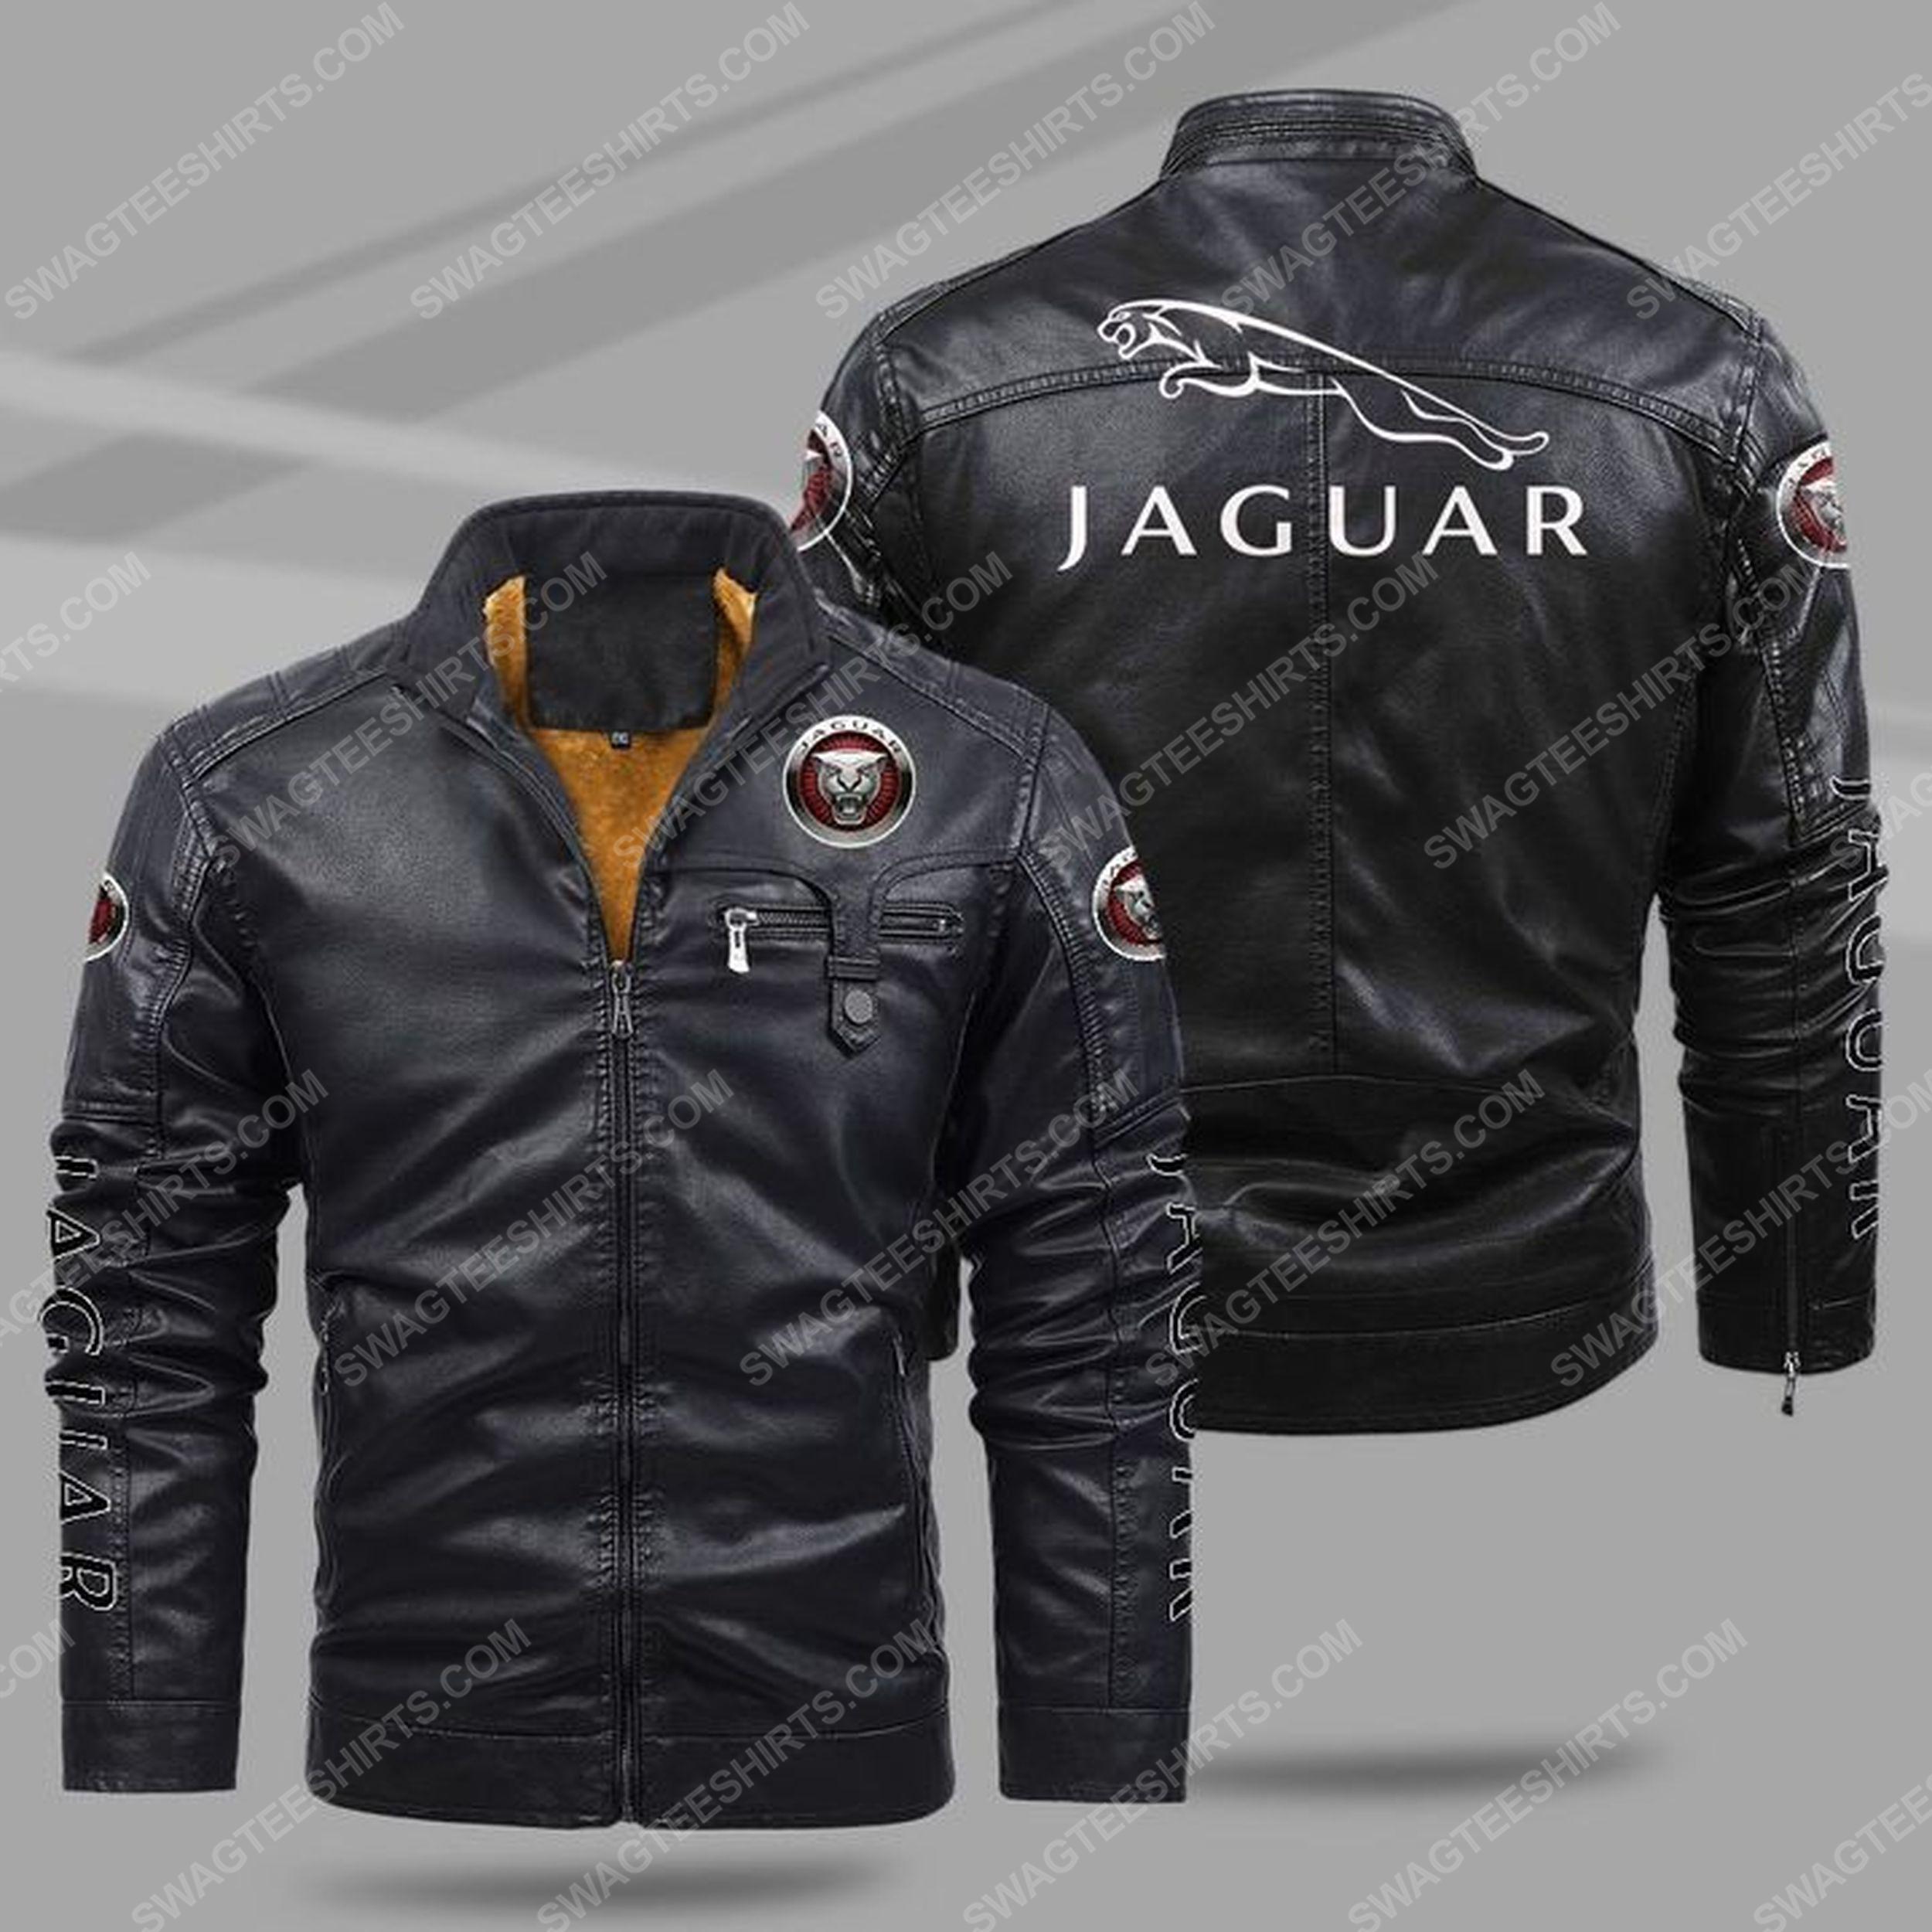 Jaguar car all over print fleece leather jacket